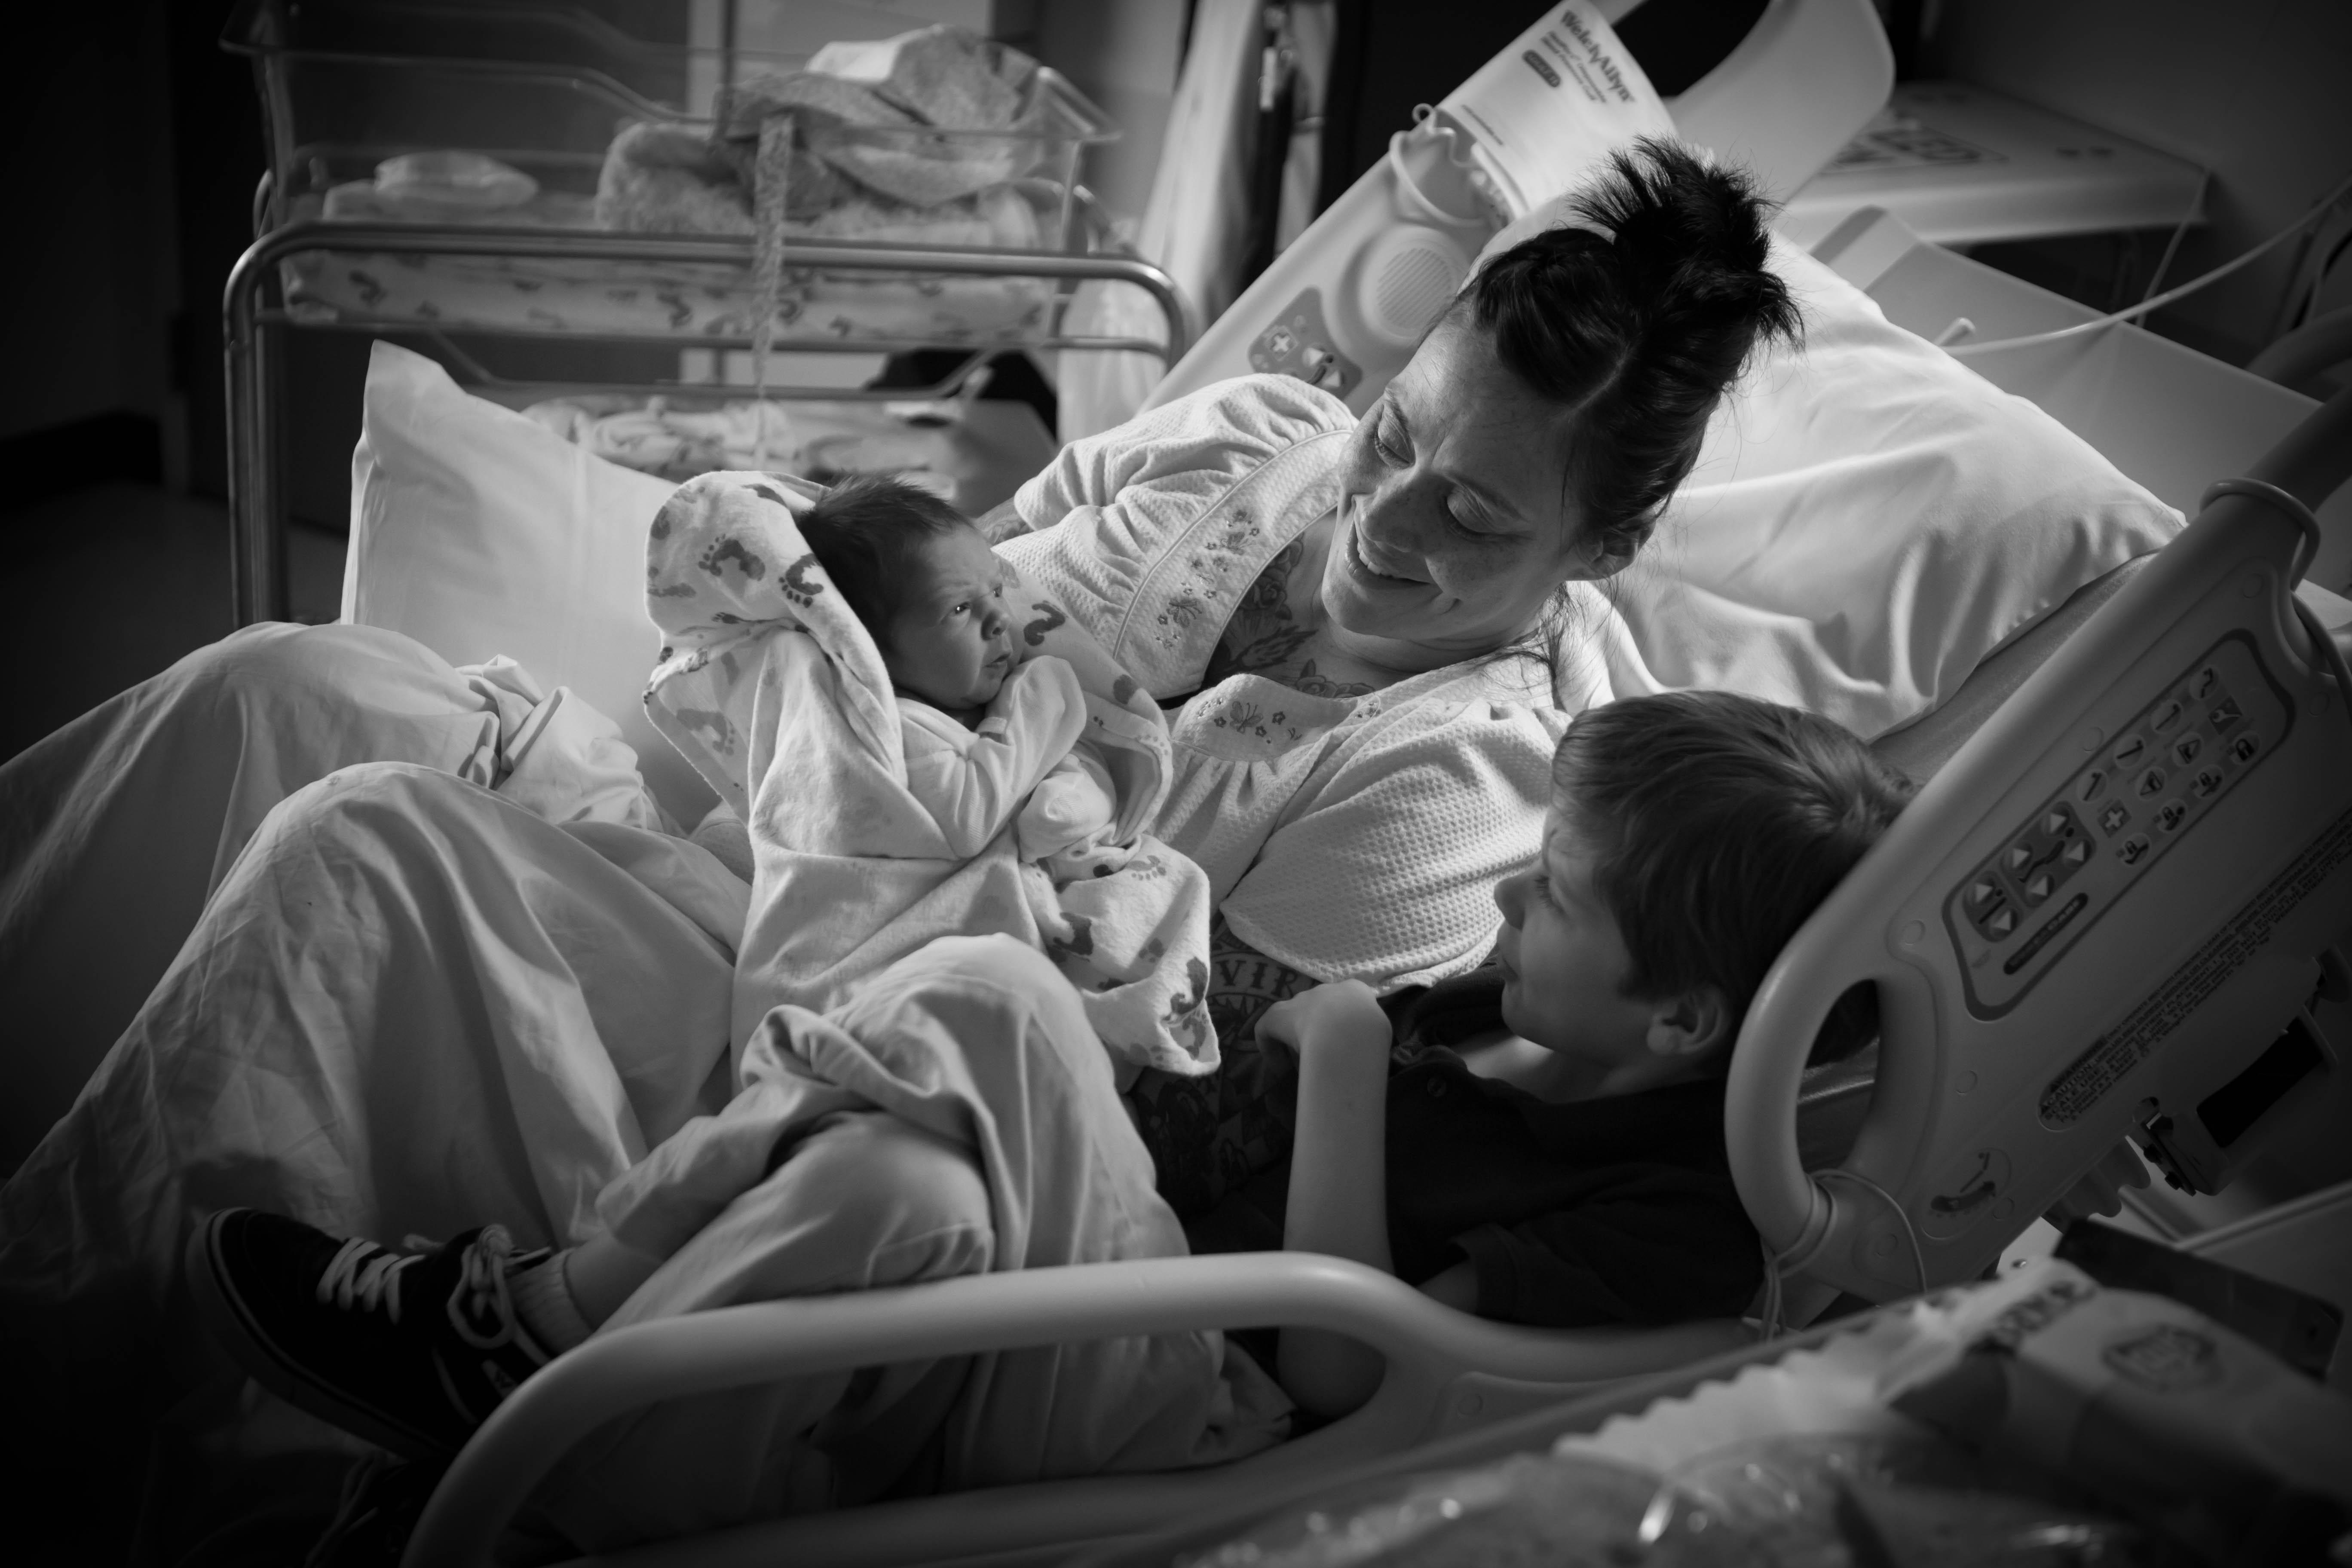 davis sacramento hospital visit pics